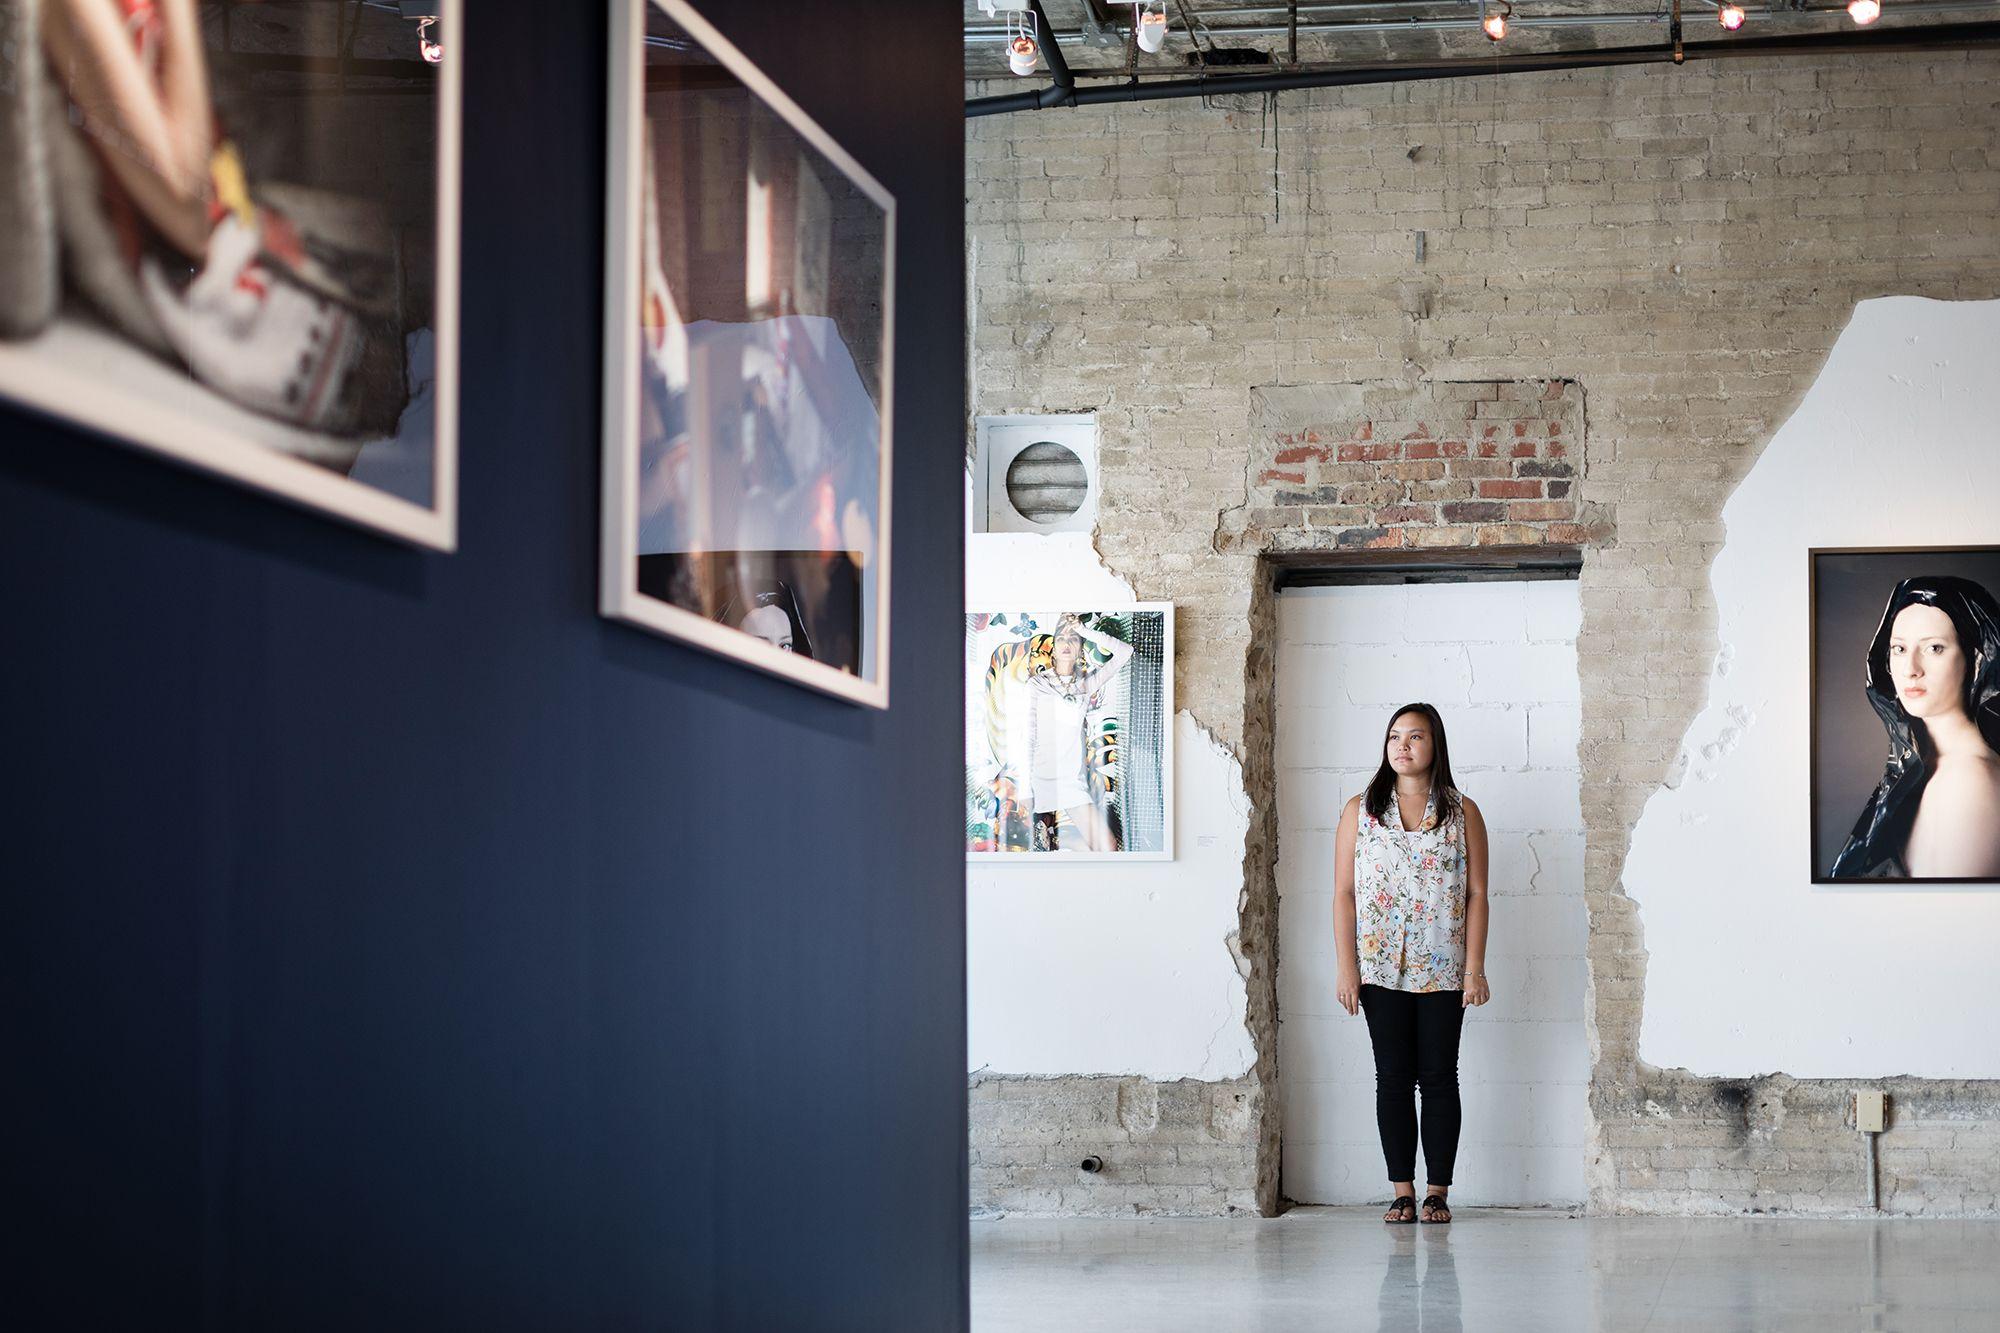 Cameron Robinson at her internship at Snap! Space, a downtown Orlando art gallery.